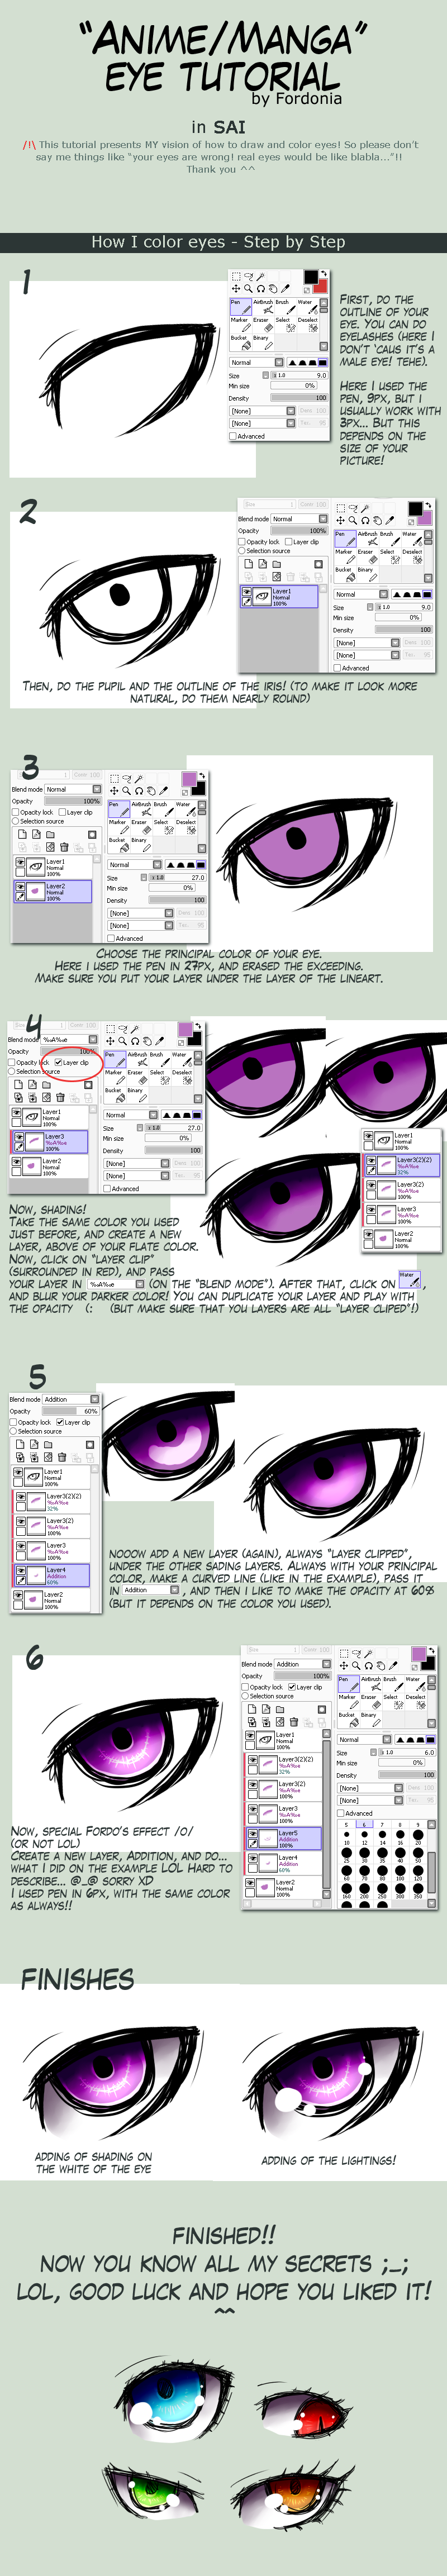 Eye tutorial - SAI by fordonia